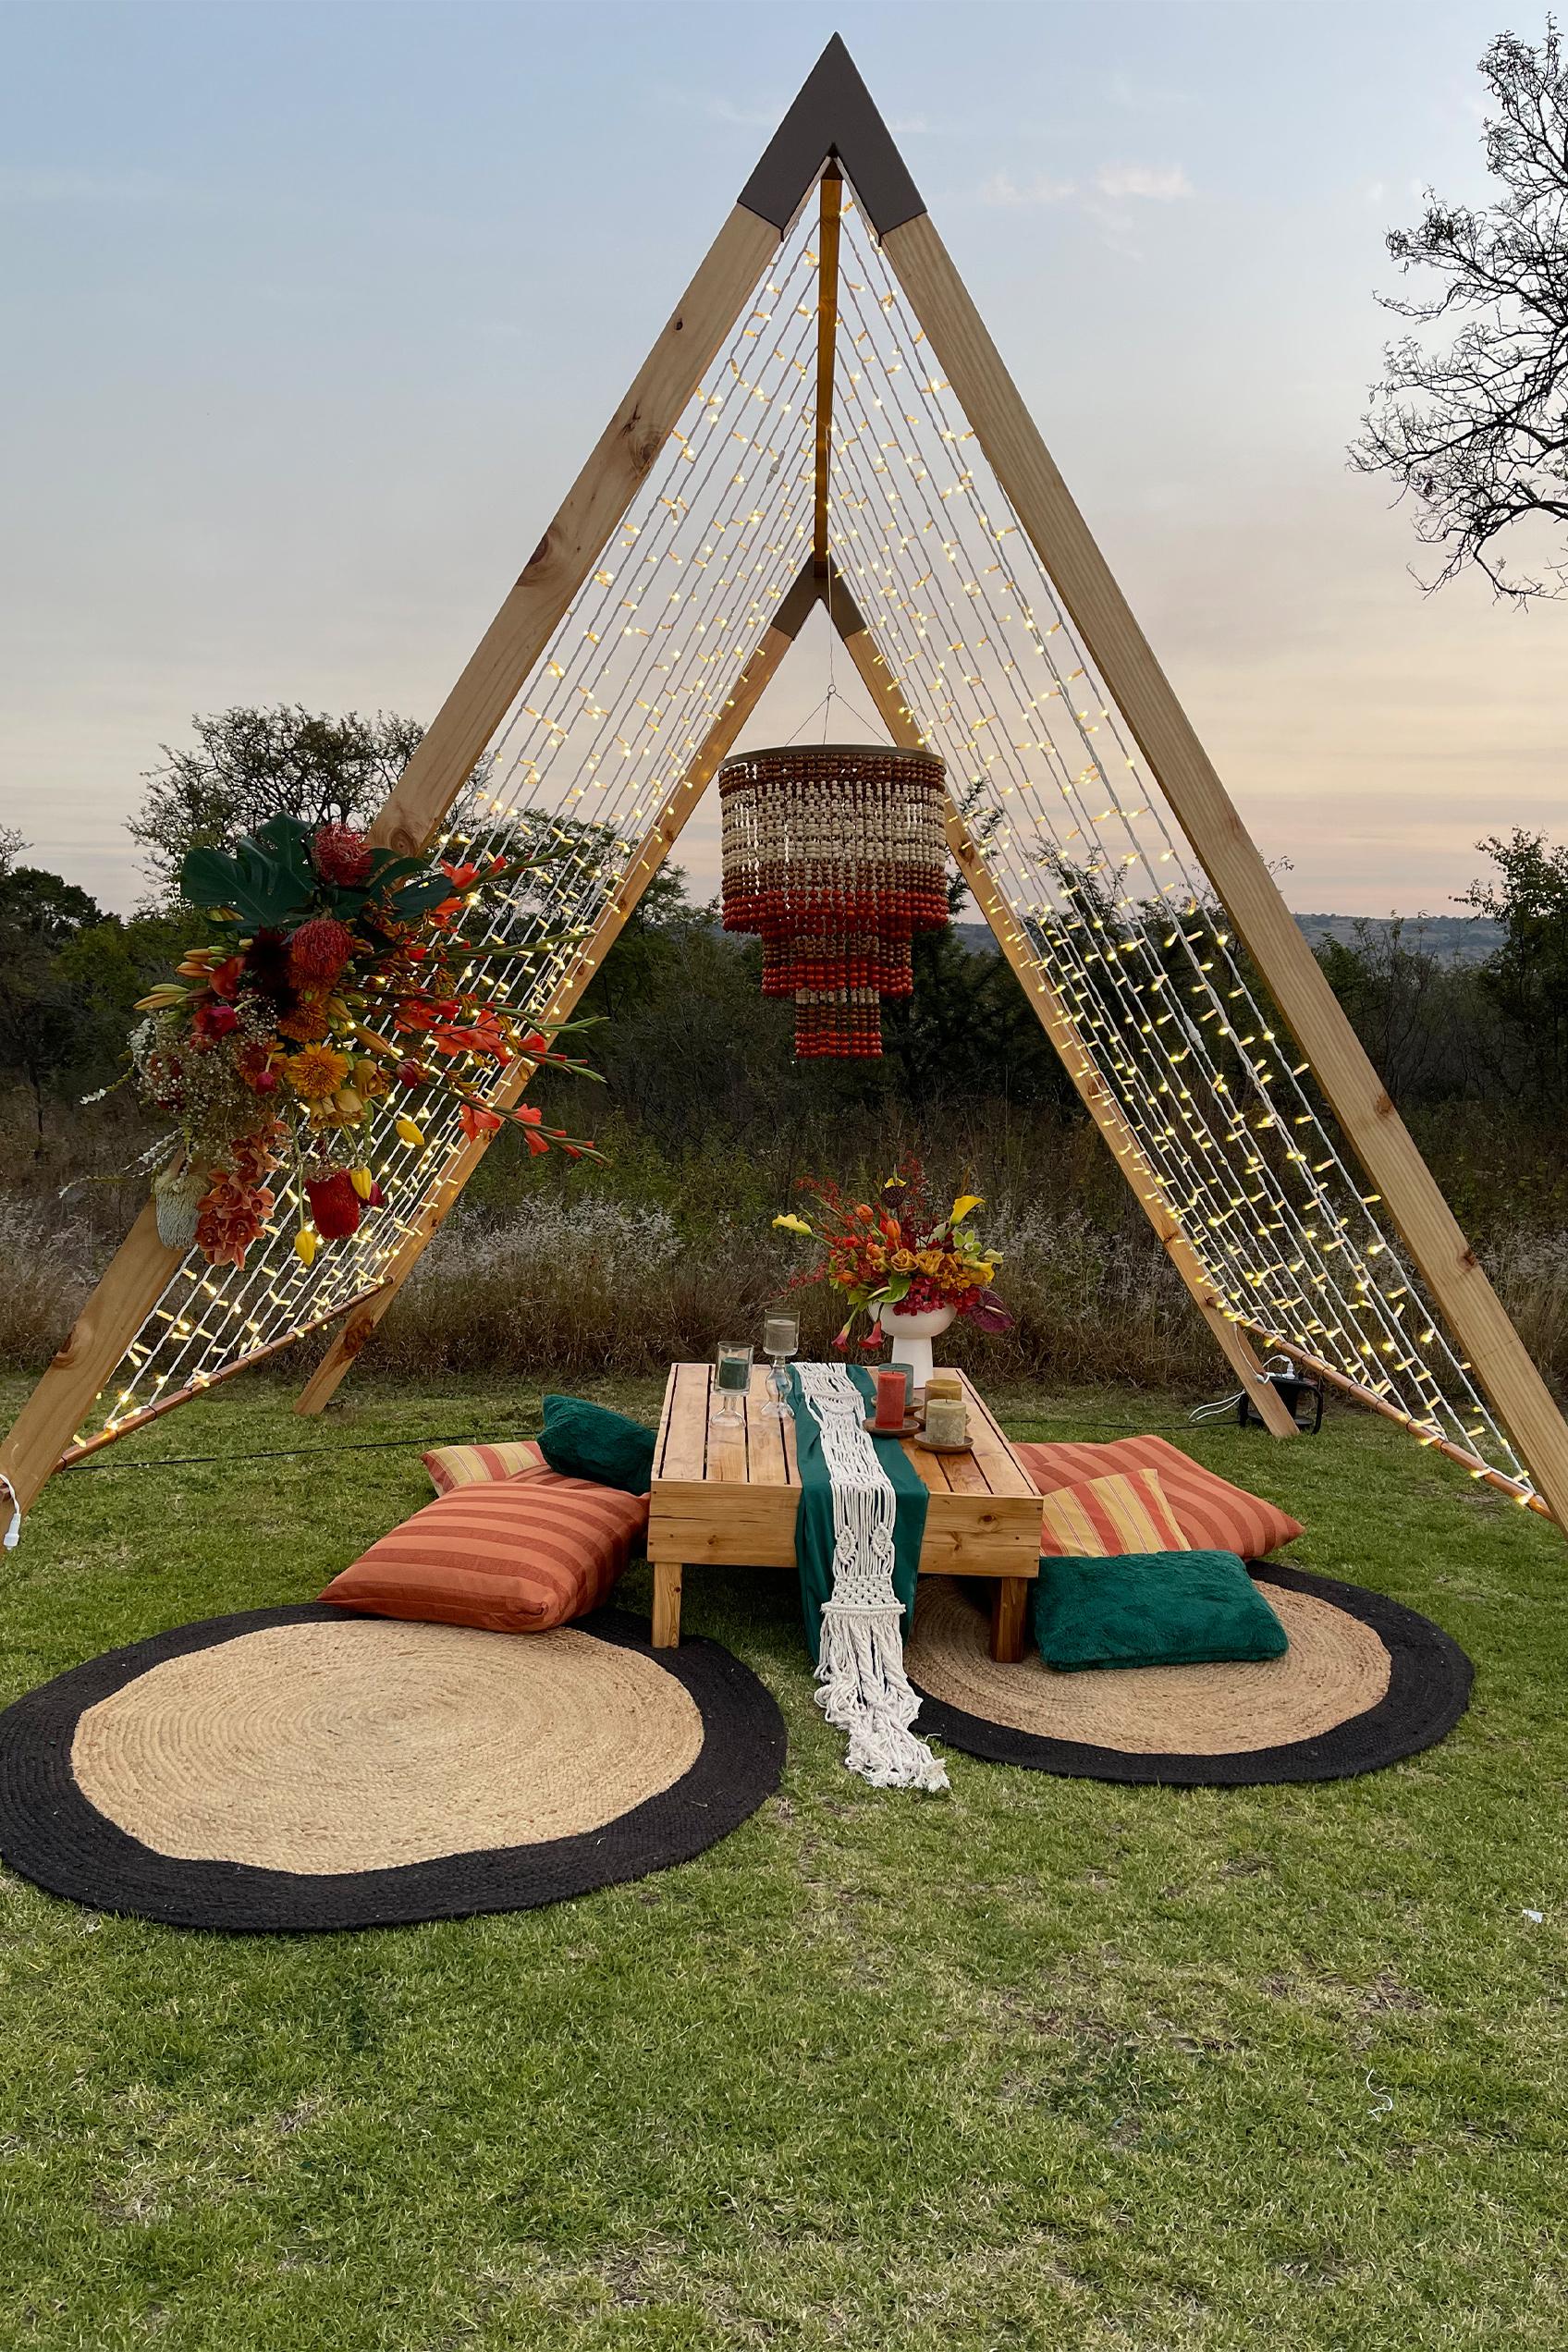 The Hanging Inspiration - Decor & Hiring Johannesburg